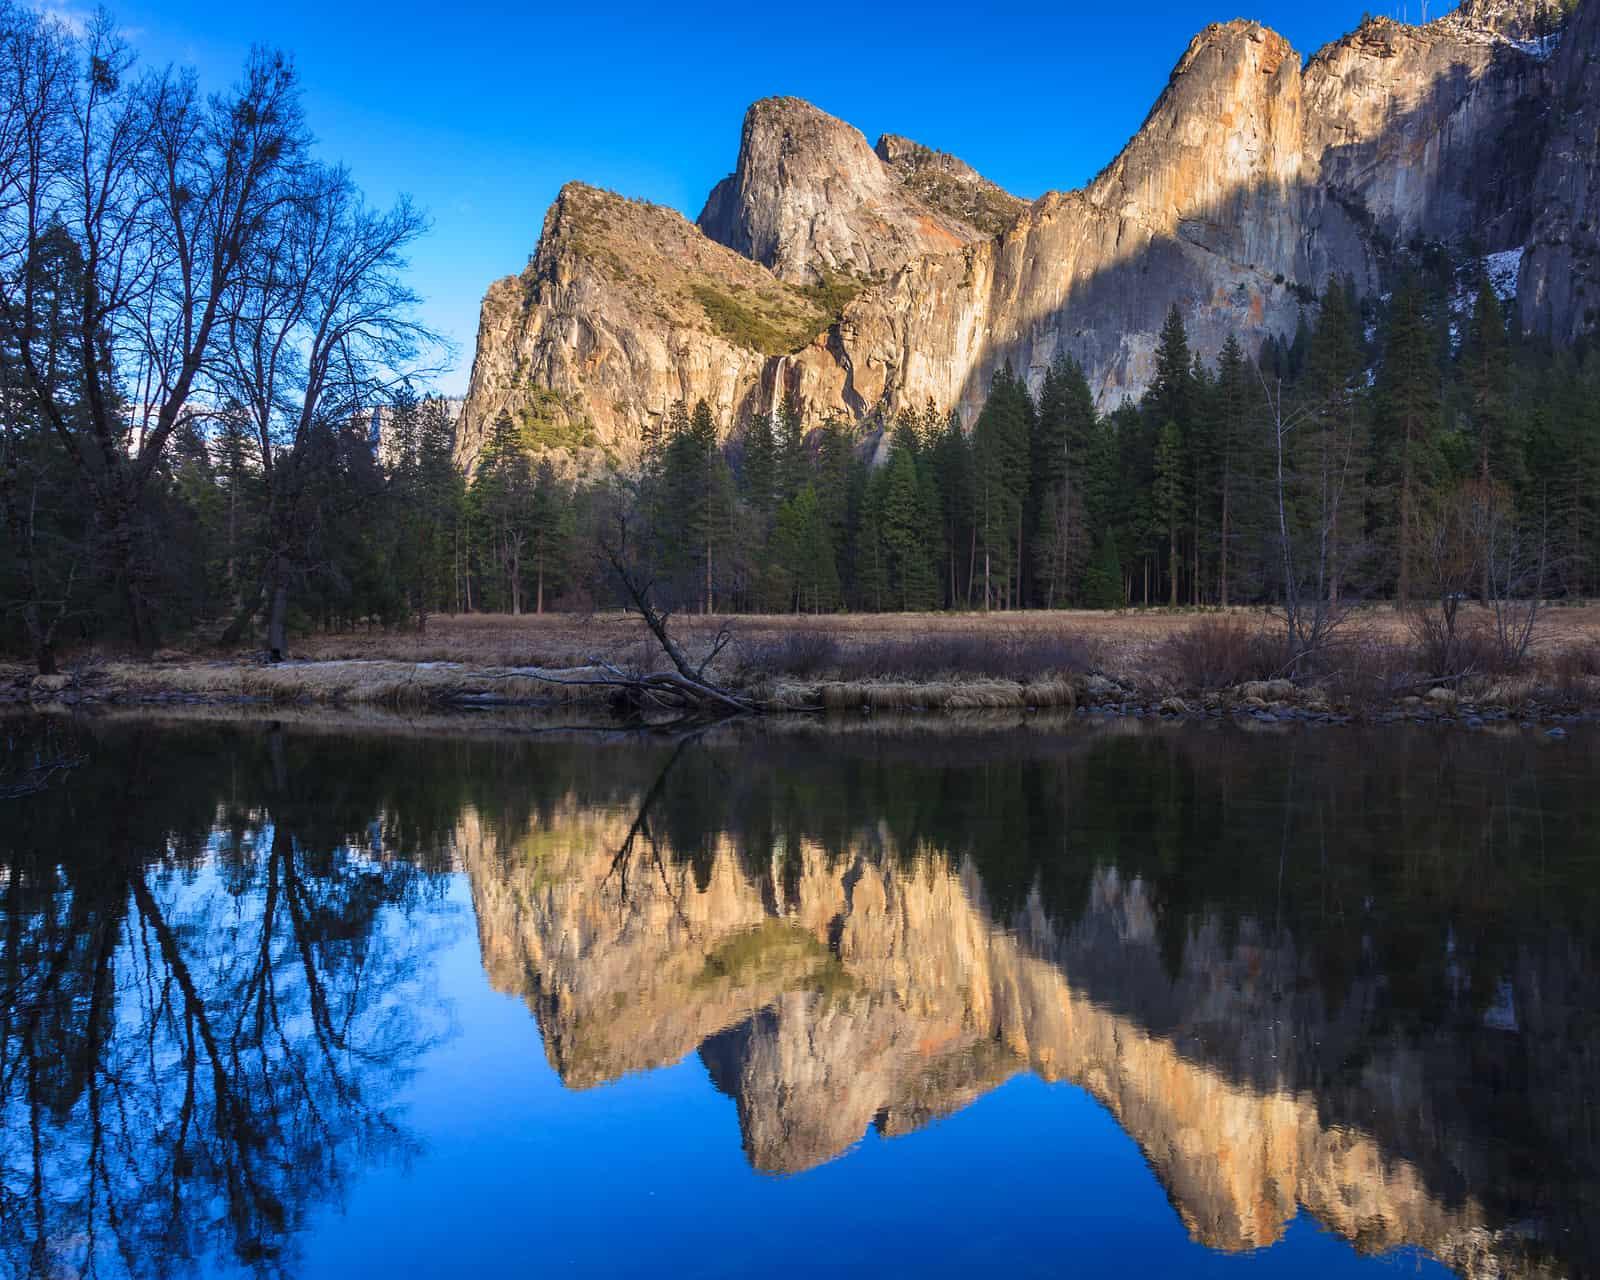 https://i2.wp.com/www.theparadigmrealtygroup.com/wp-content/uploads/2017/10/bigstock-Cathedral-Rocks-Reflections-40631113.jpg